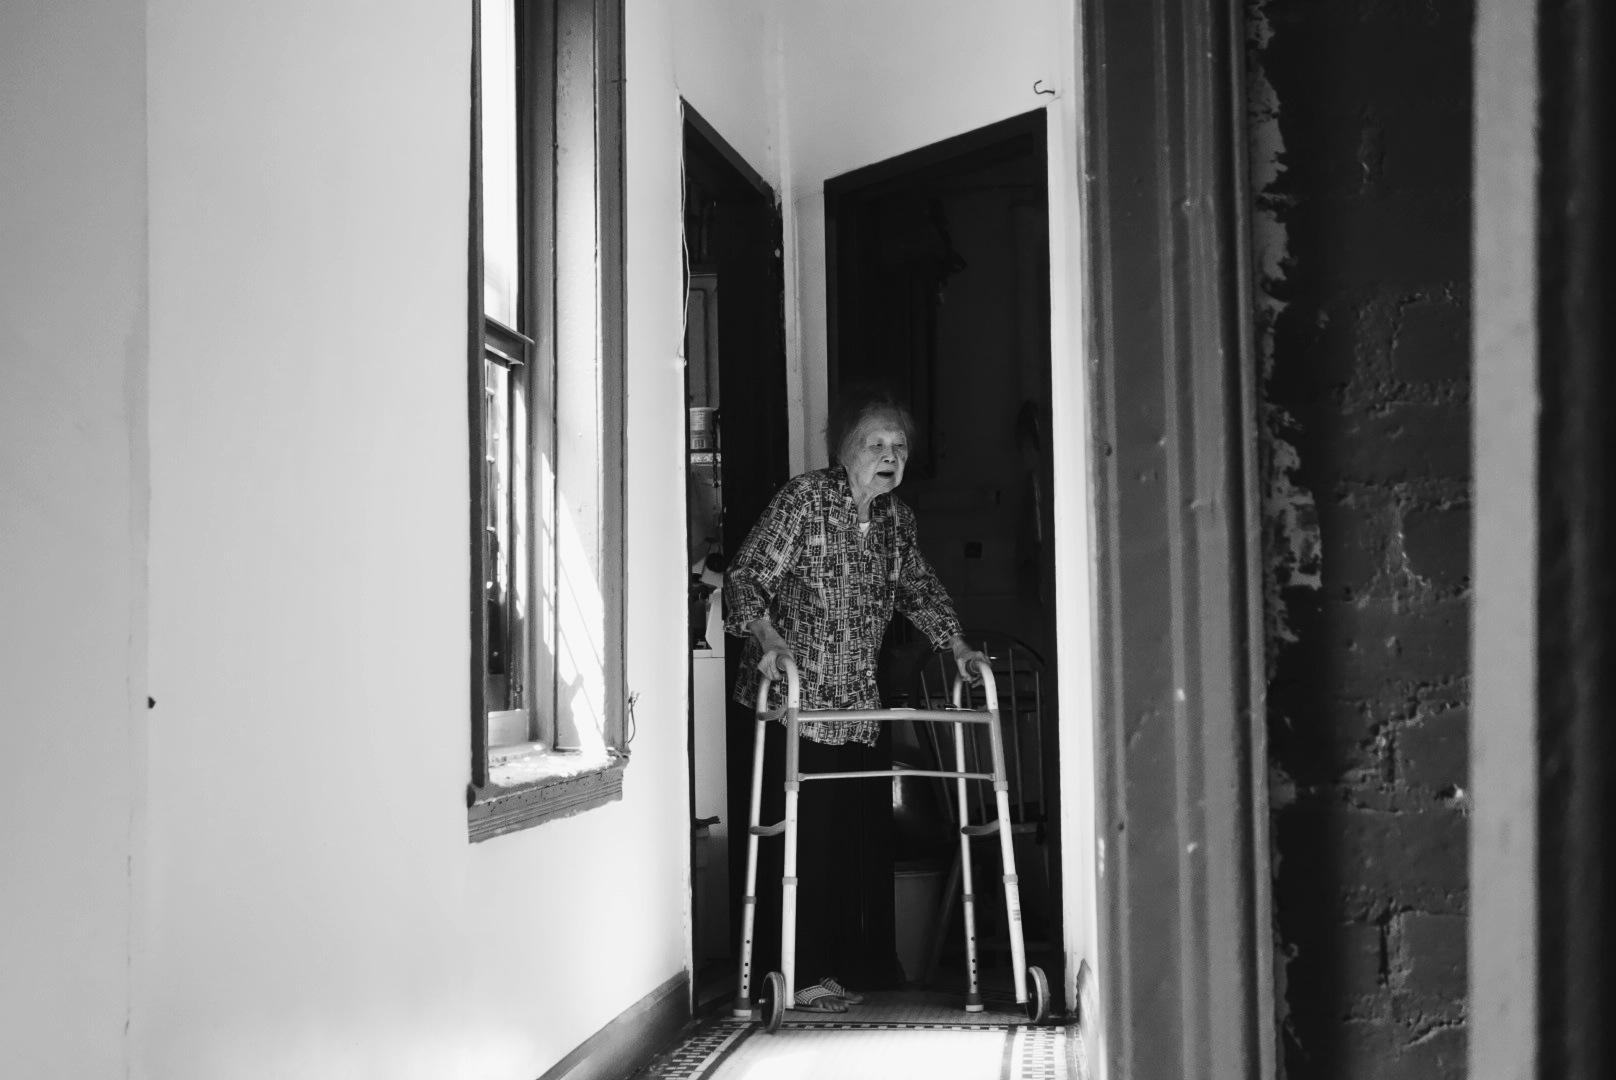 My Elderly Neighbor